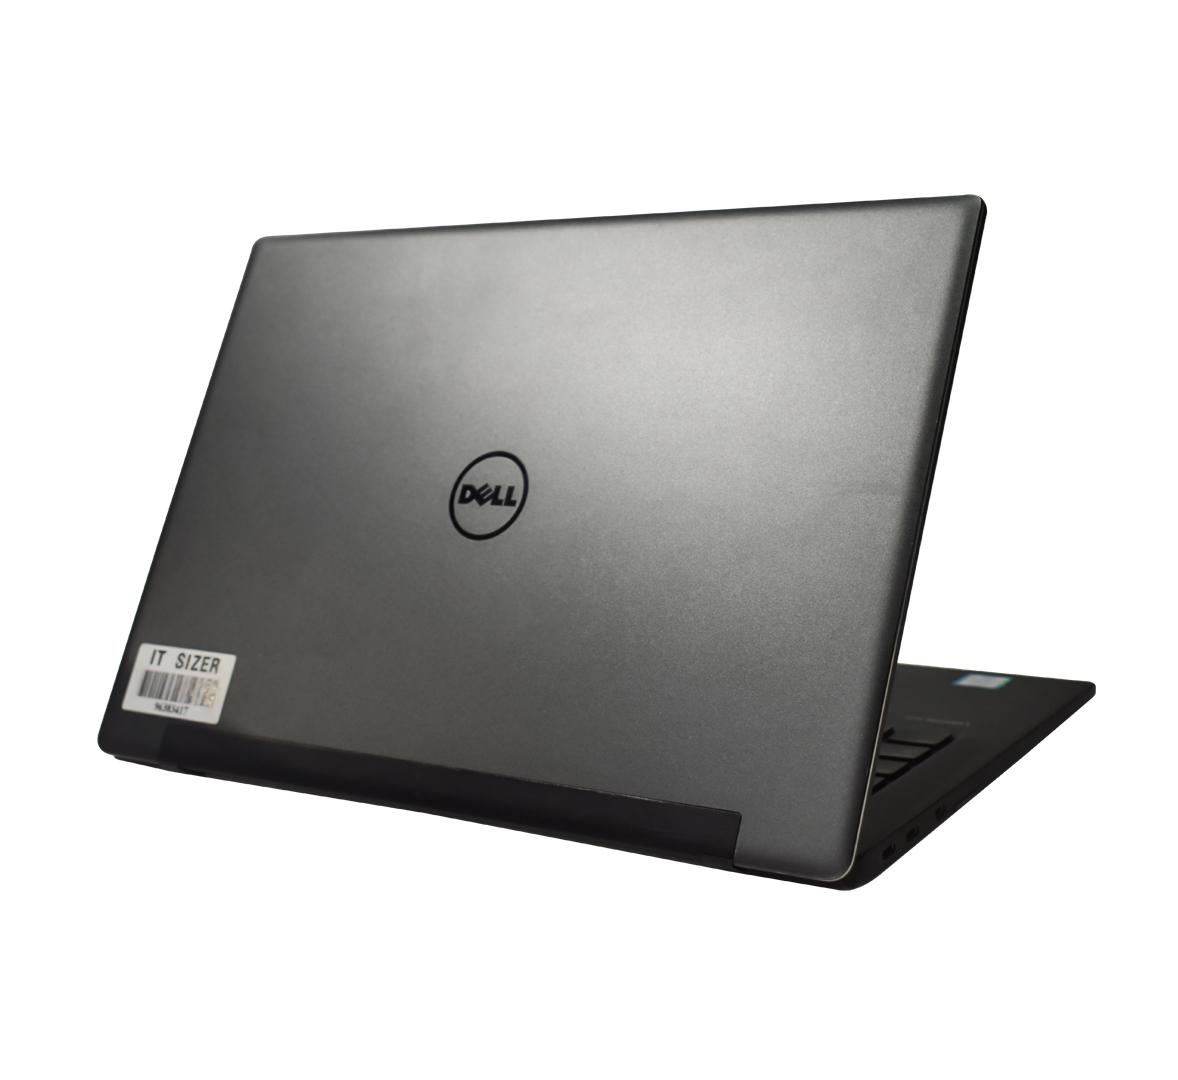 Dell Latitude 7370 Business Laptop, Intel Core i5-6Y57 CPU, 8GB DDR3 BUILTIN RAM, 256GB SSD M2, 13 inch Display, Windows 10 Pro (Refurbished)